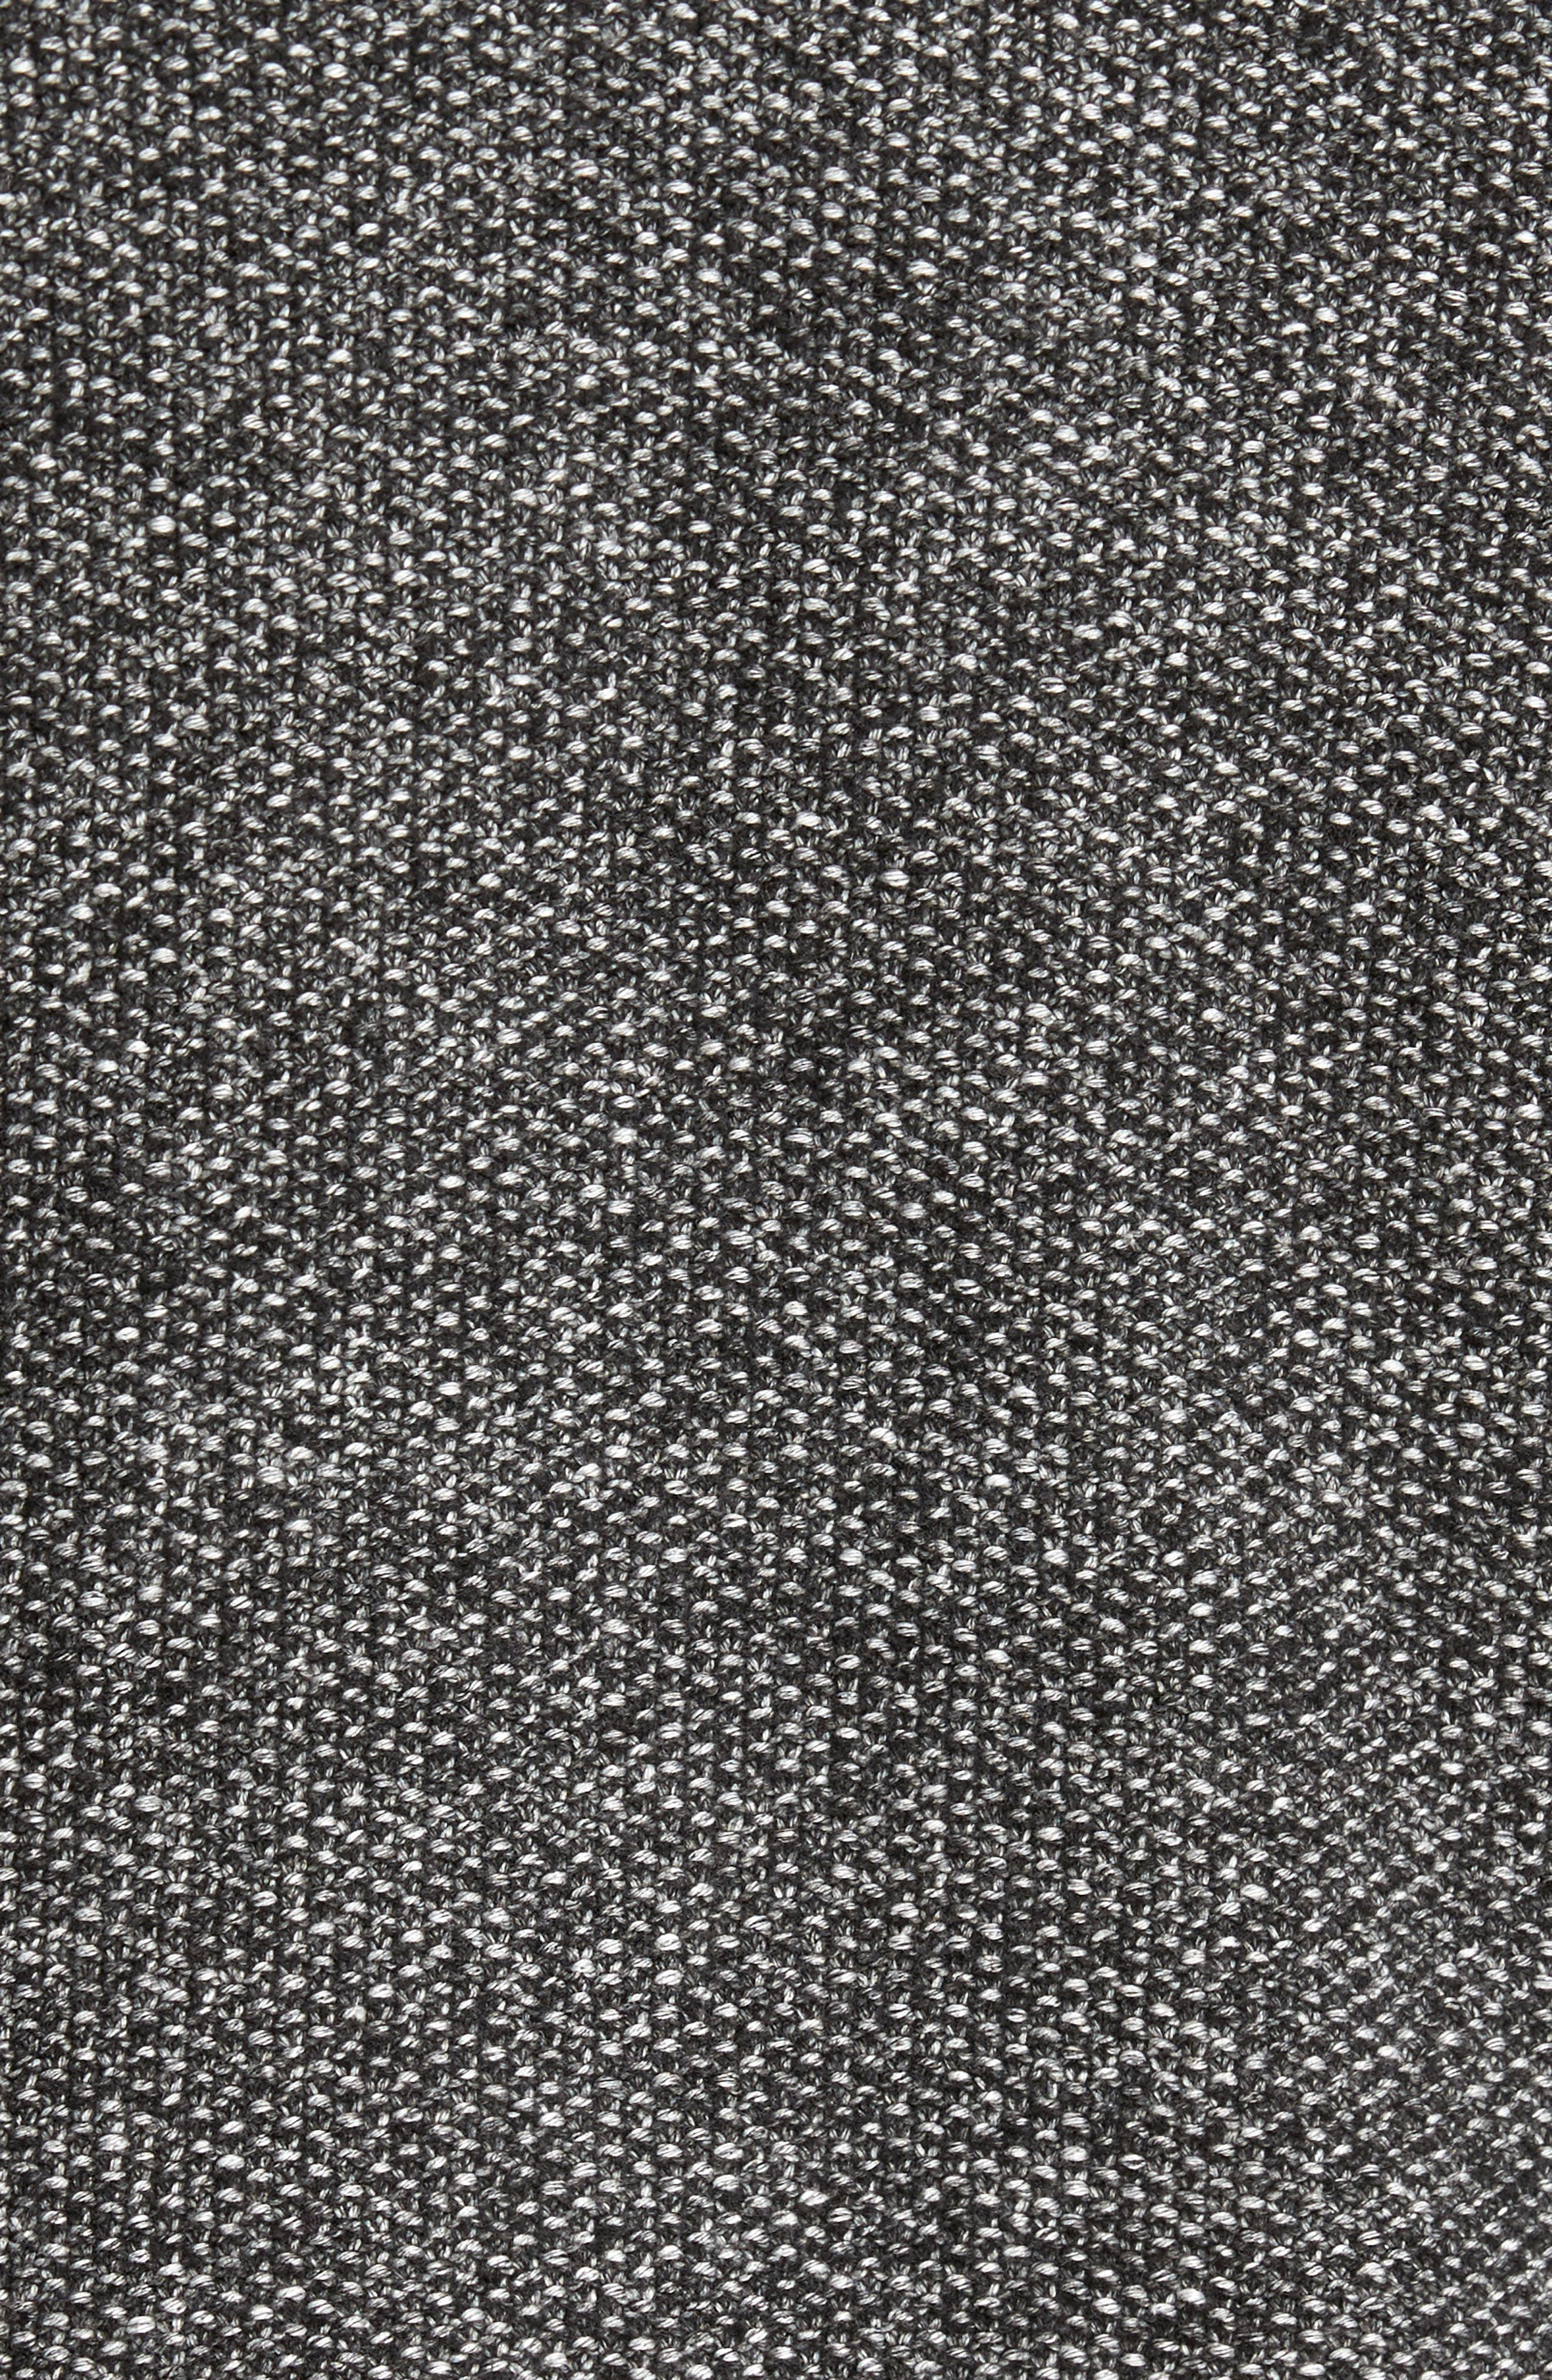 Seed Stitch Baseball Cardigan,                             Alternate thumbnail 5, color,                             001